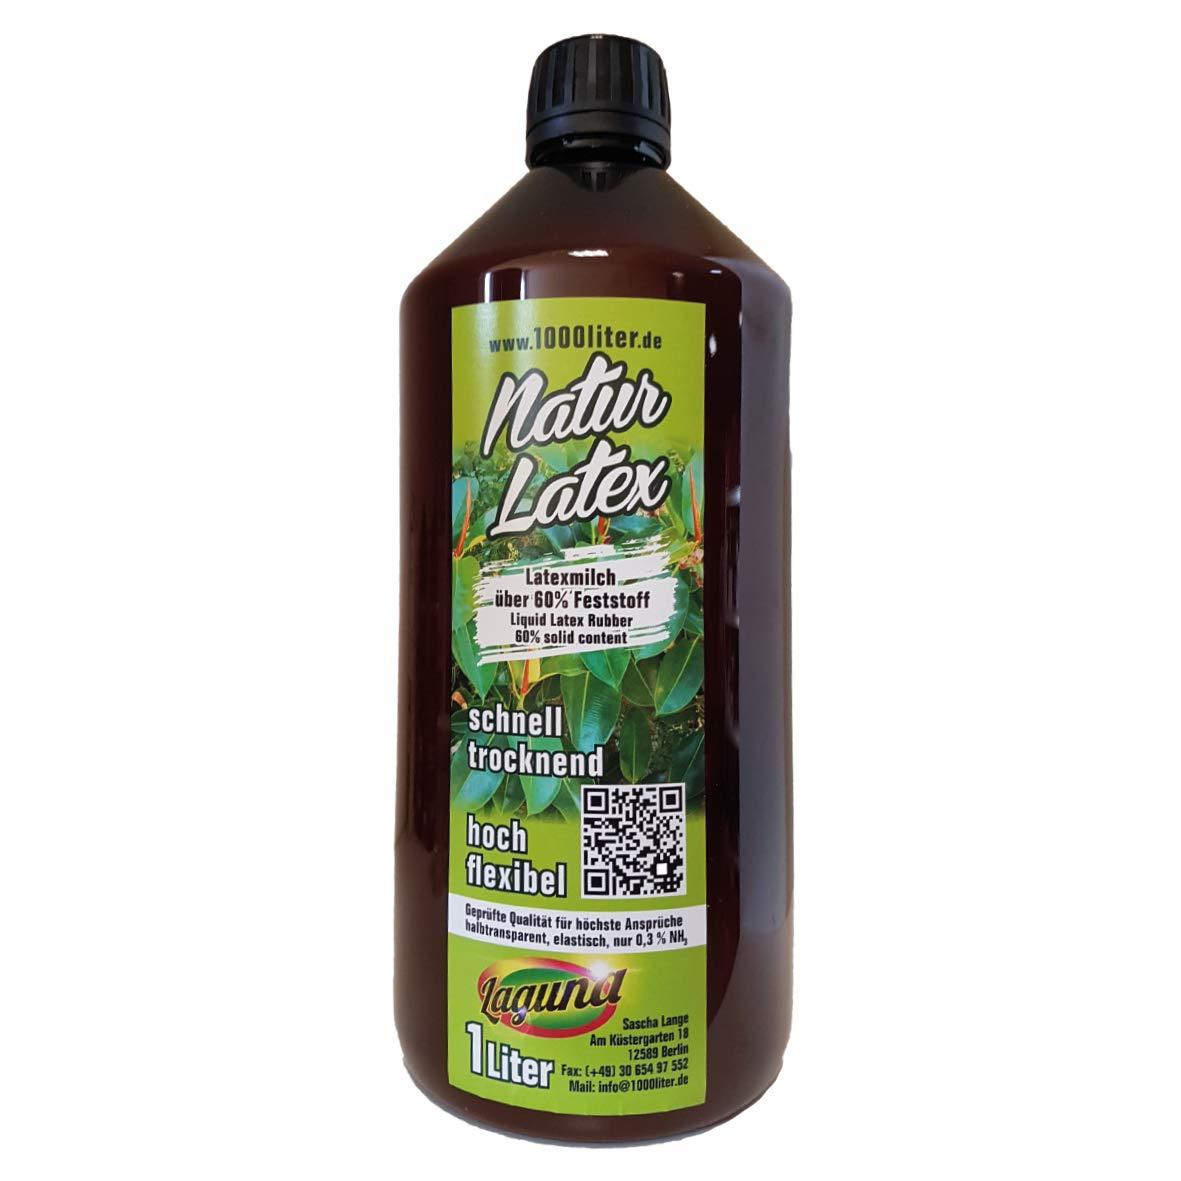 Liquid Latex Natural Latex 1000 ml Mask Maker Craft Green Line Latex Milk Latex 1 Litre Givul, Pre-Vulcanised Colok GmbH